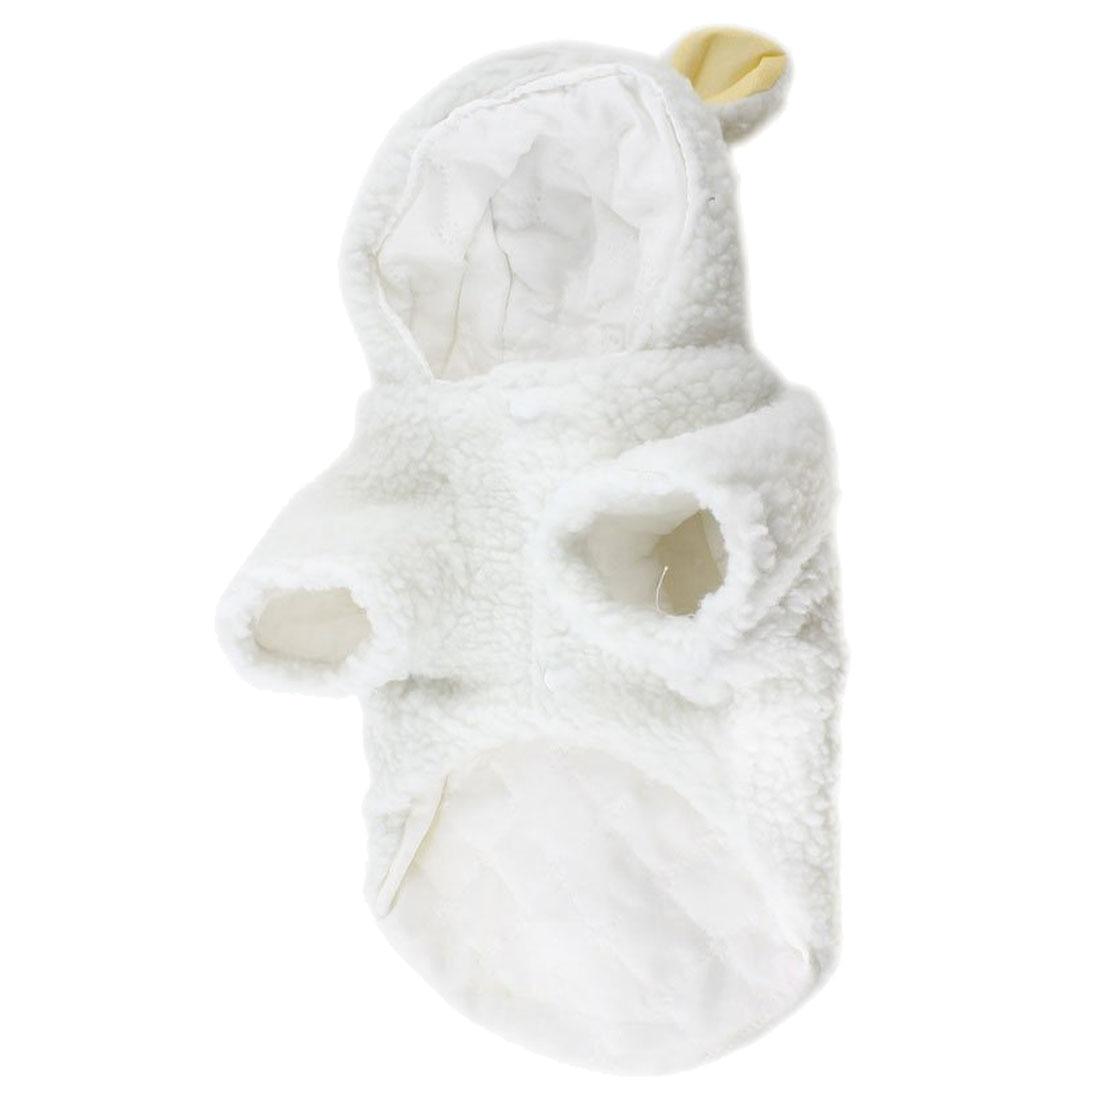 LHLL-White Sheep Design Press Stud Button Pet Dog Poodle Coat Costume L